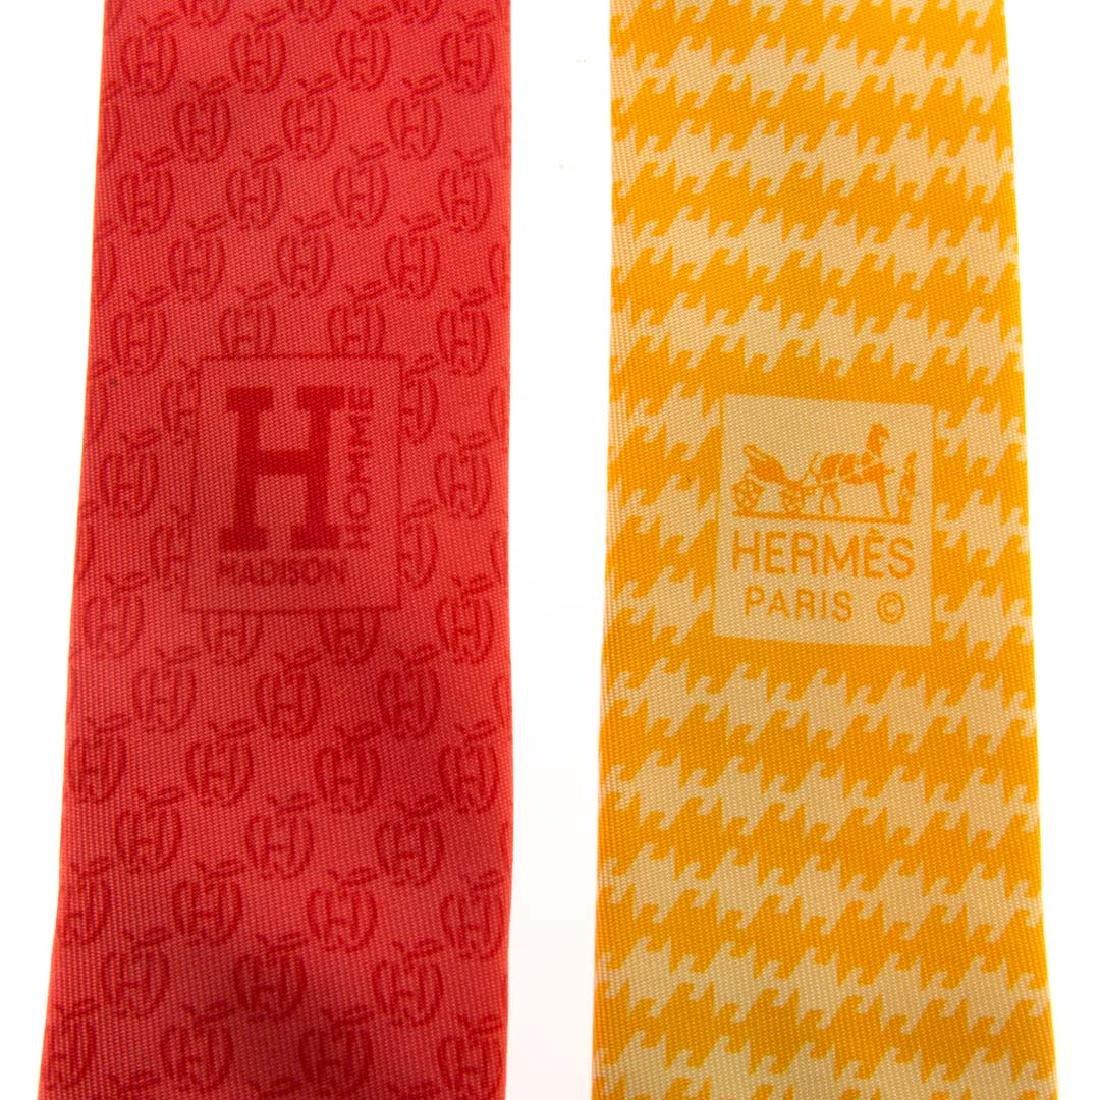 Hermès Apple Print Tie & Hounds Tooth Print Tie - 7